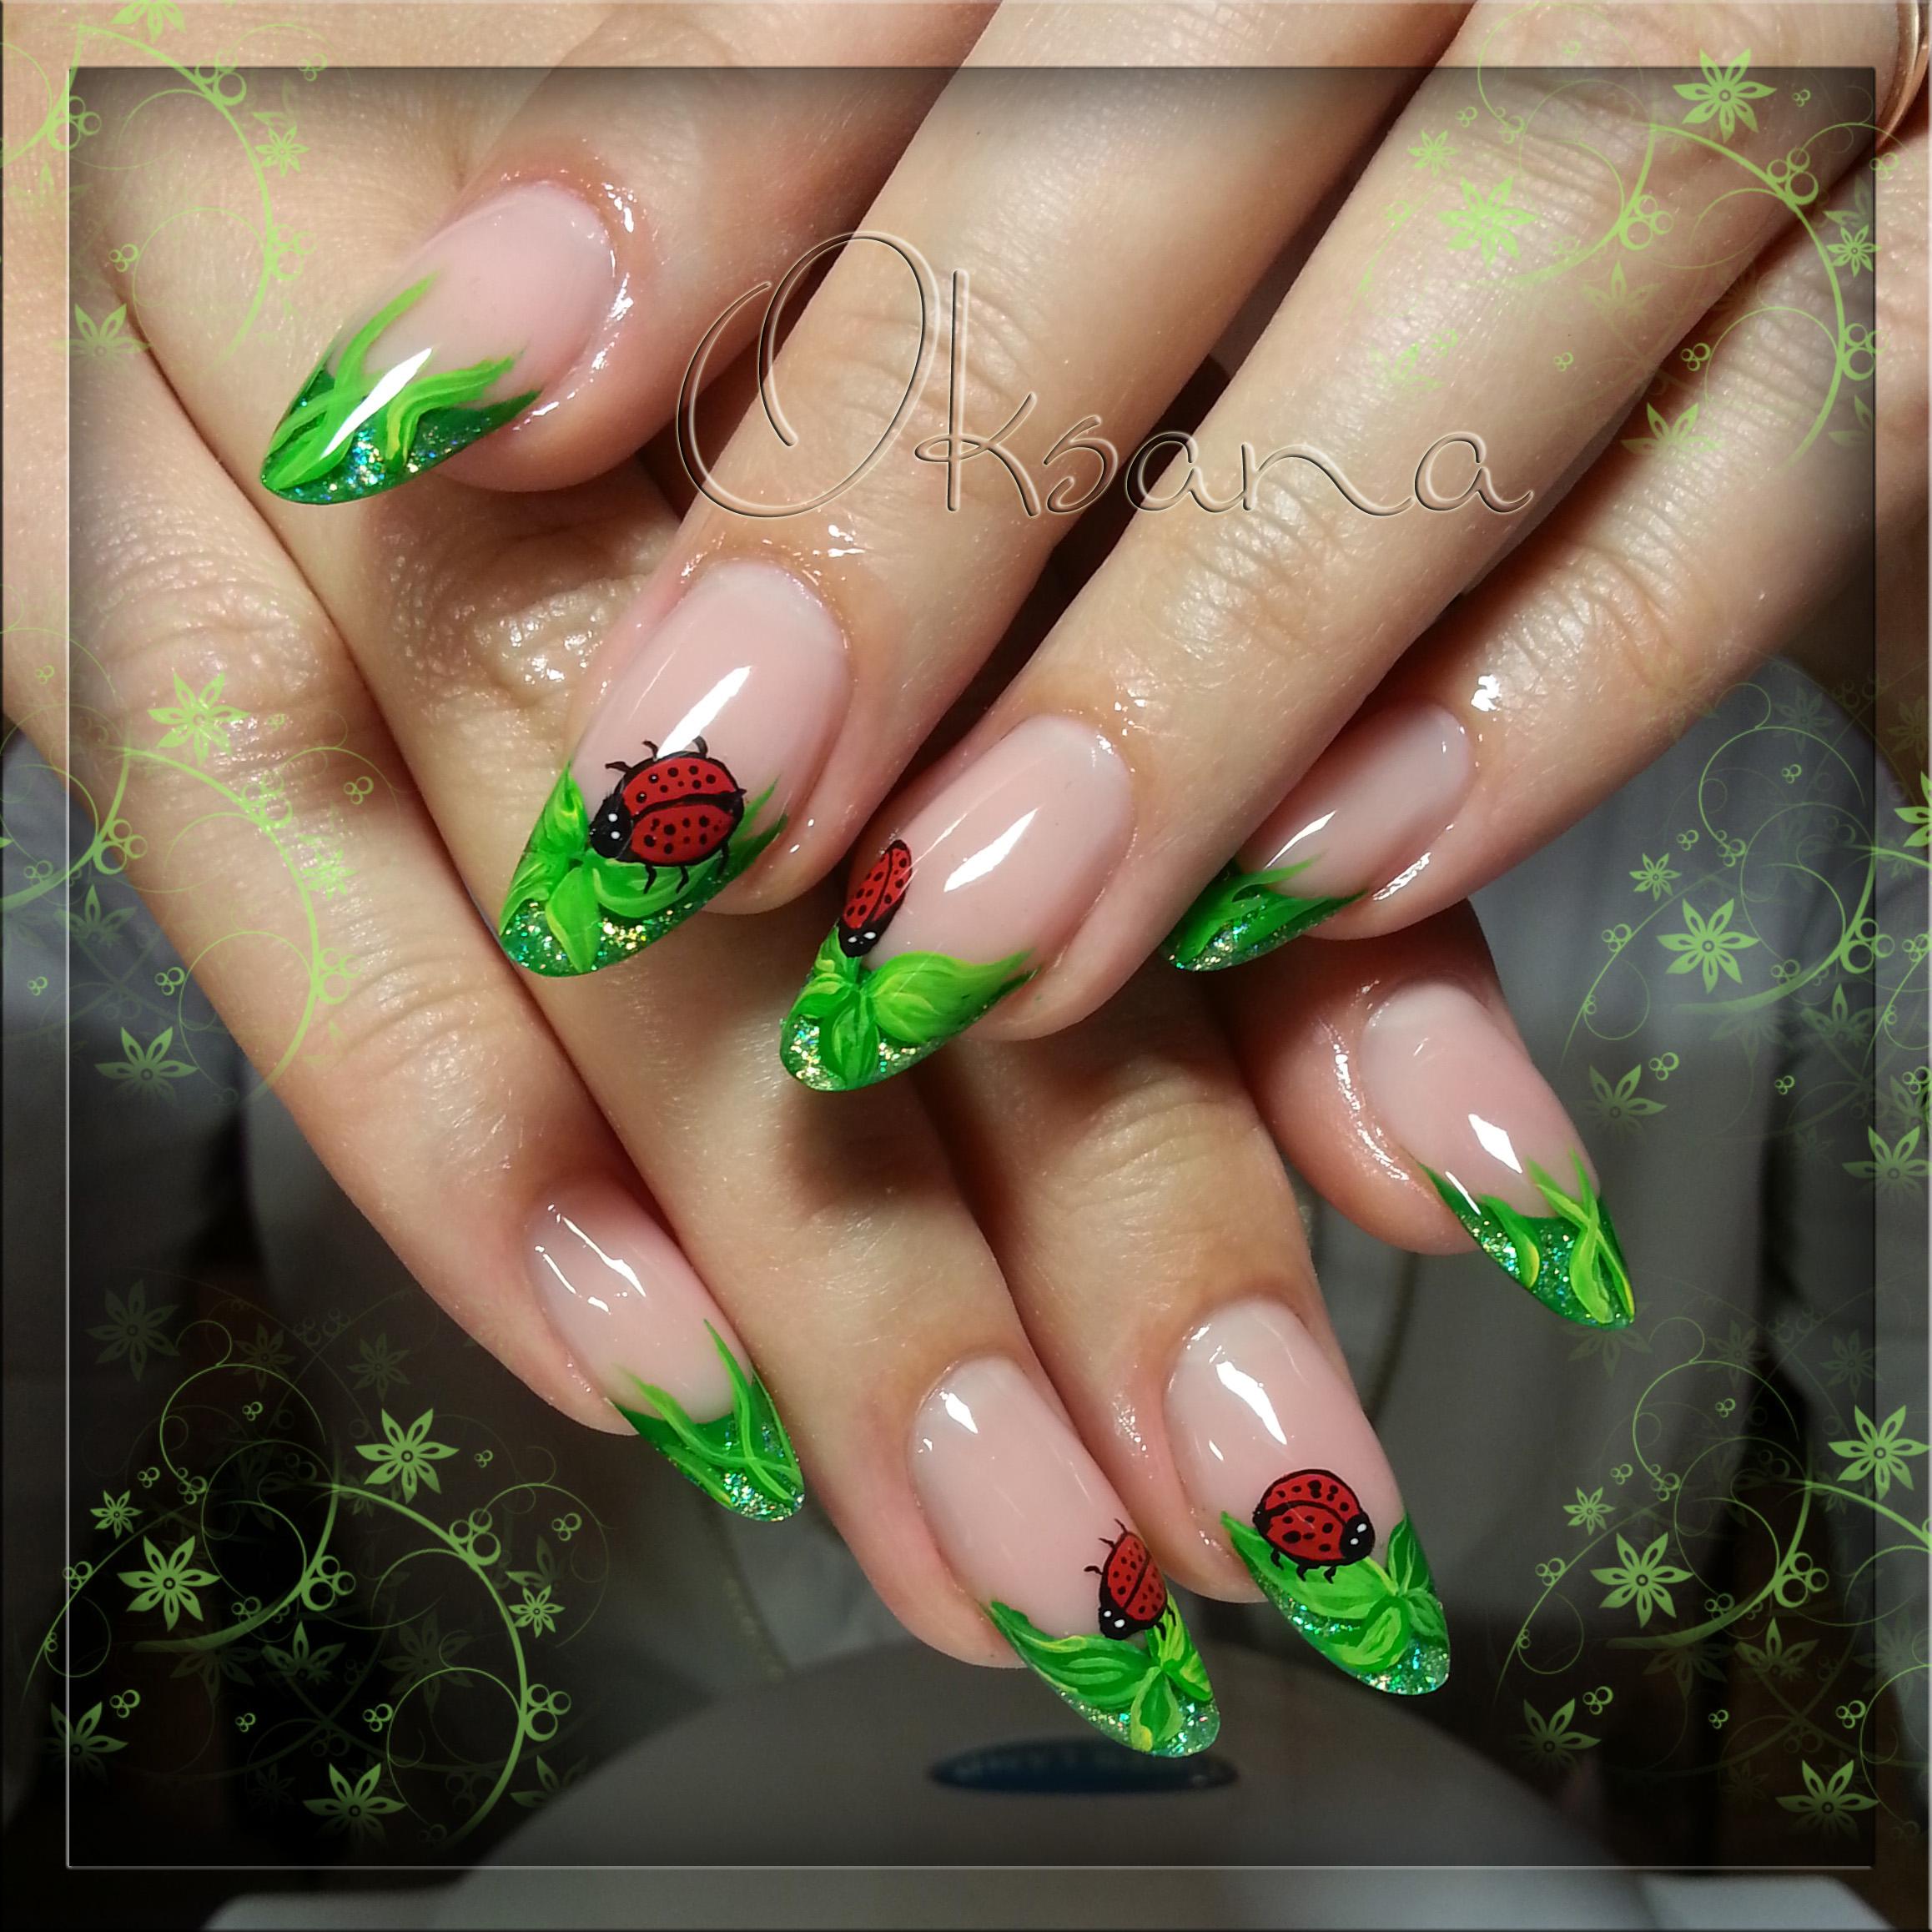 Дизайн ногтей 2016 фото новинки зеленый